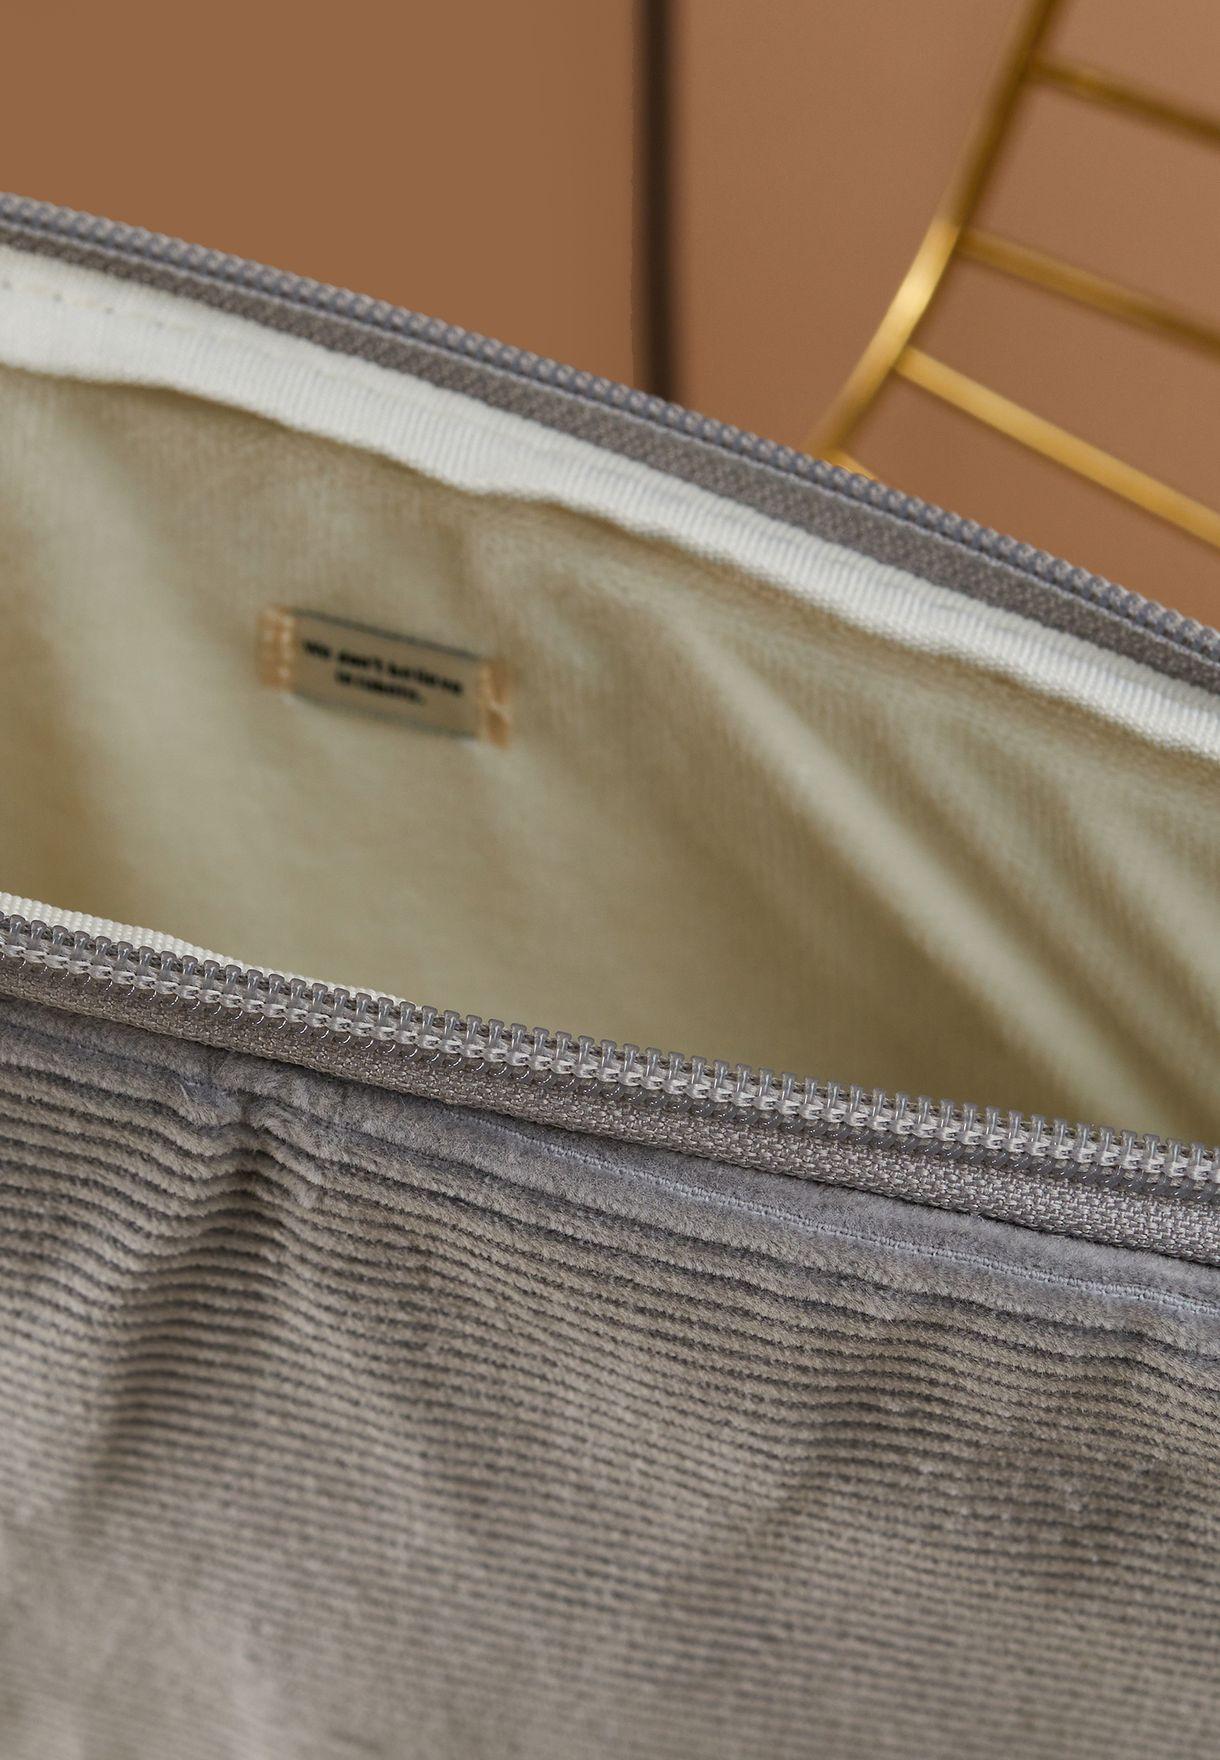 13' Oxford Corduroy Laptop Case